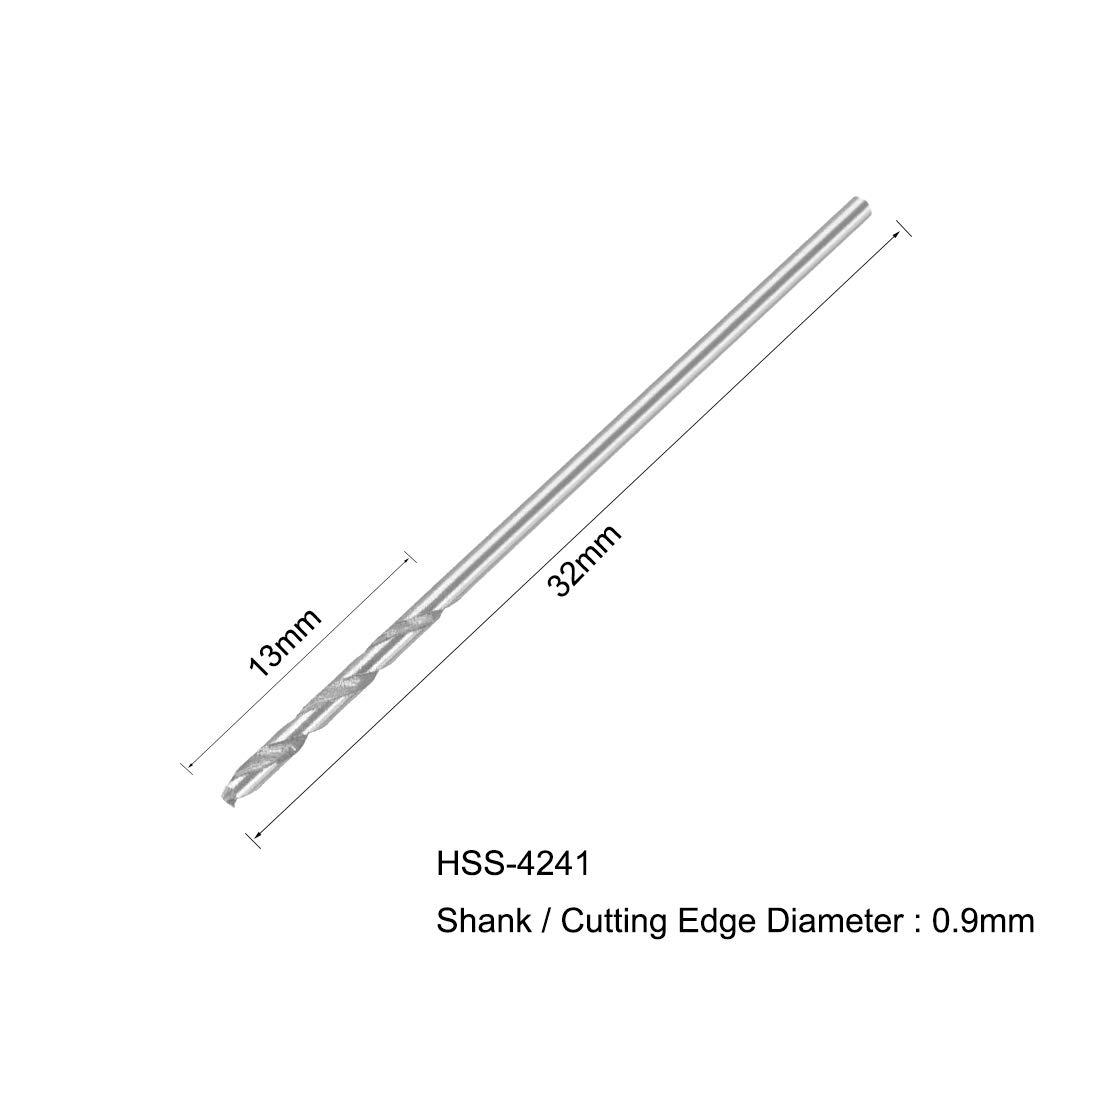 uxcell 4.3mm Twist Drill High Speed Steel Bit HSS-4241 for Steel,Aluminum Alloy 10pcs